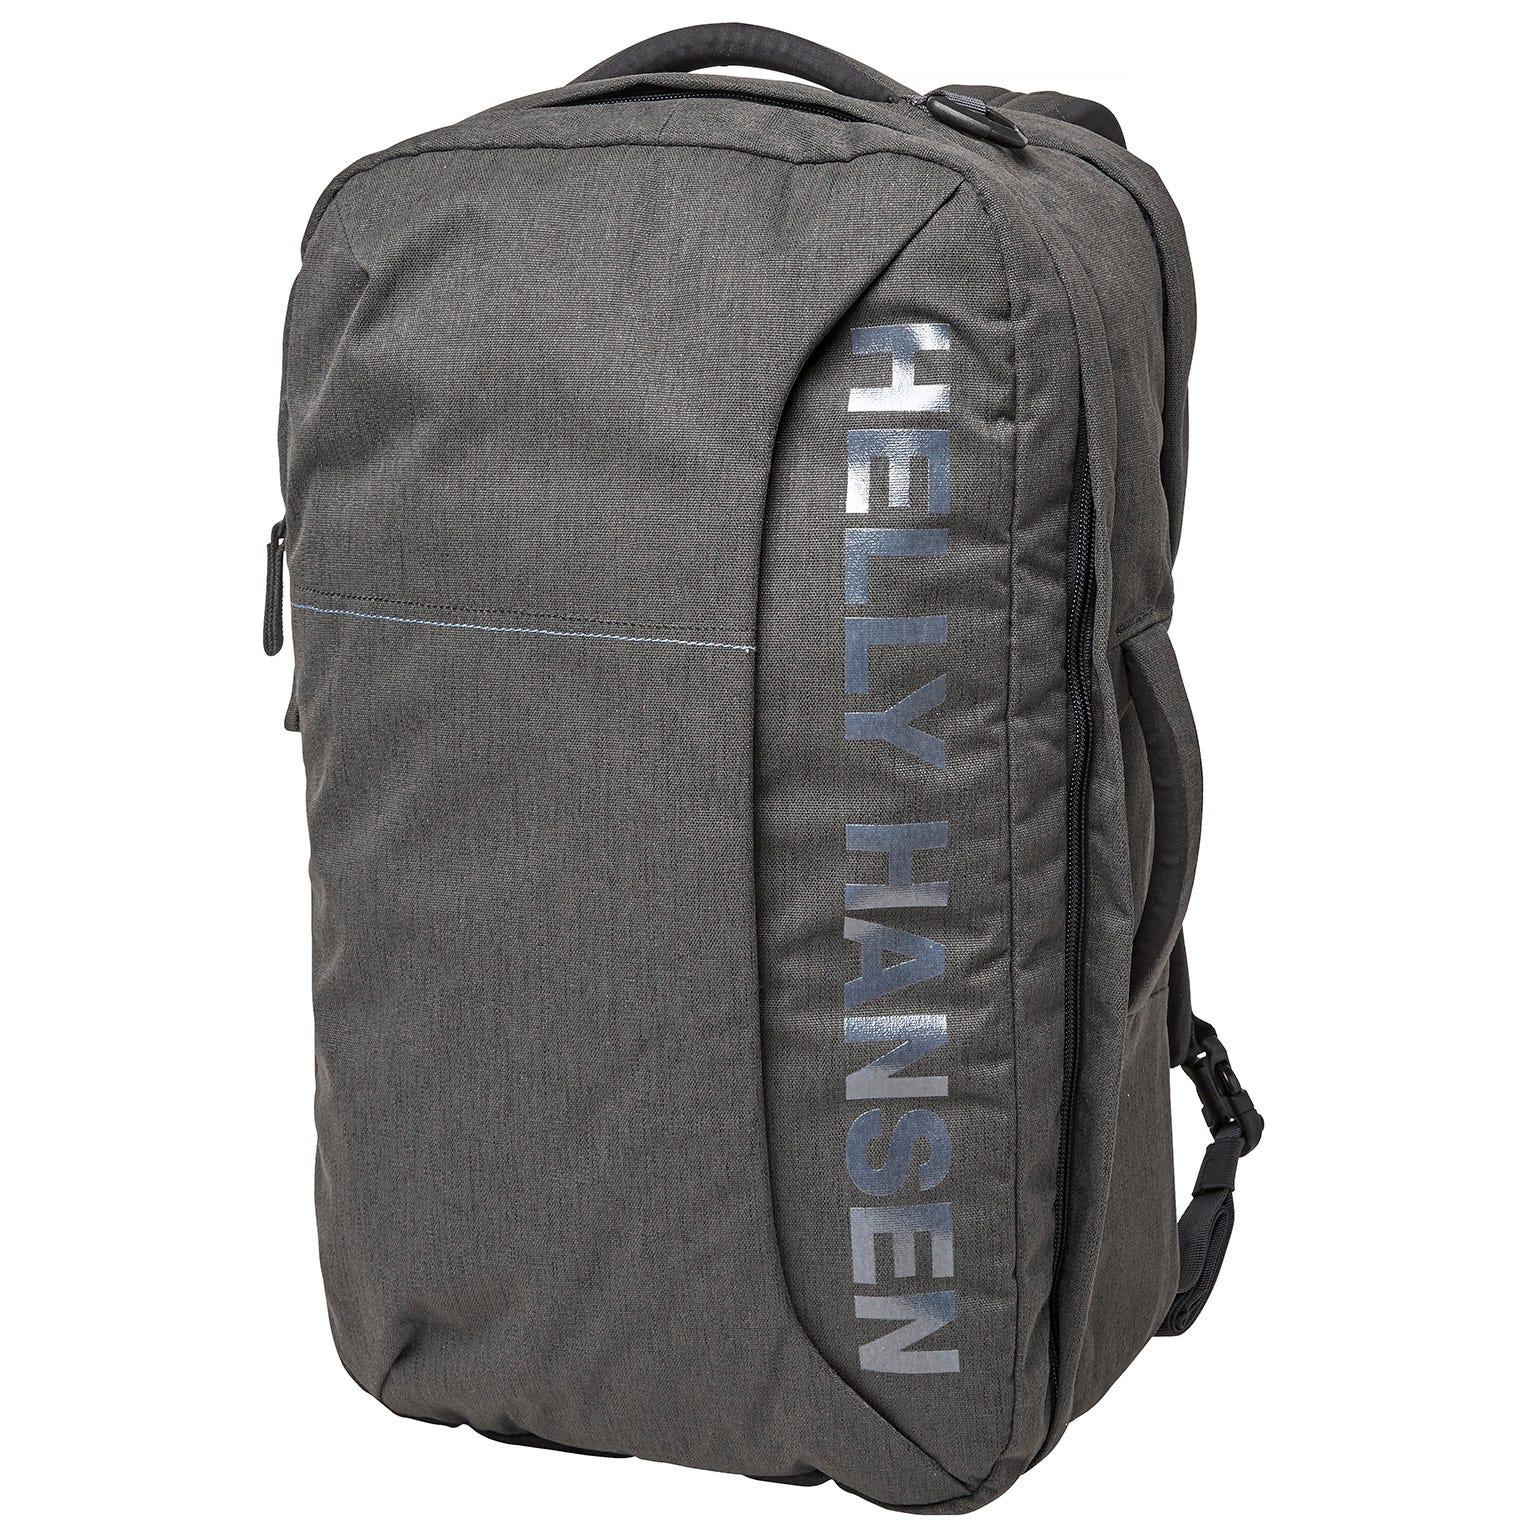 Helly Hansen Expedition Bag 2.0 Black STD